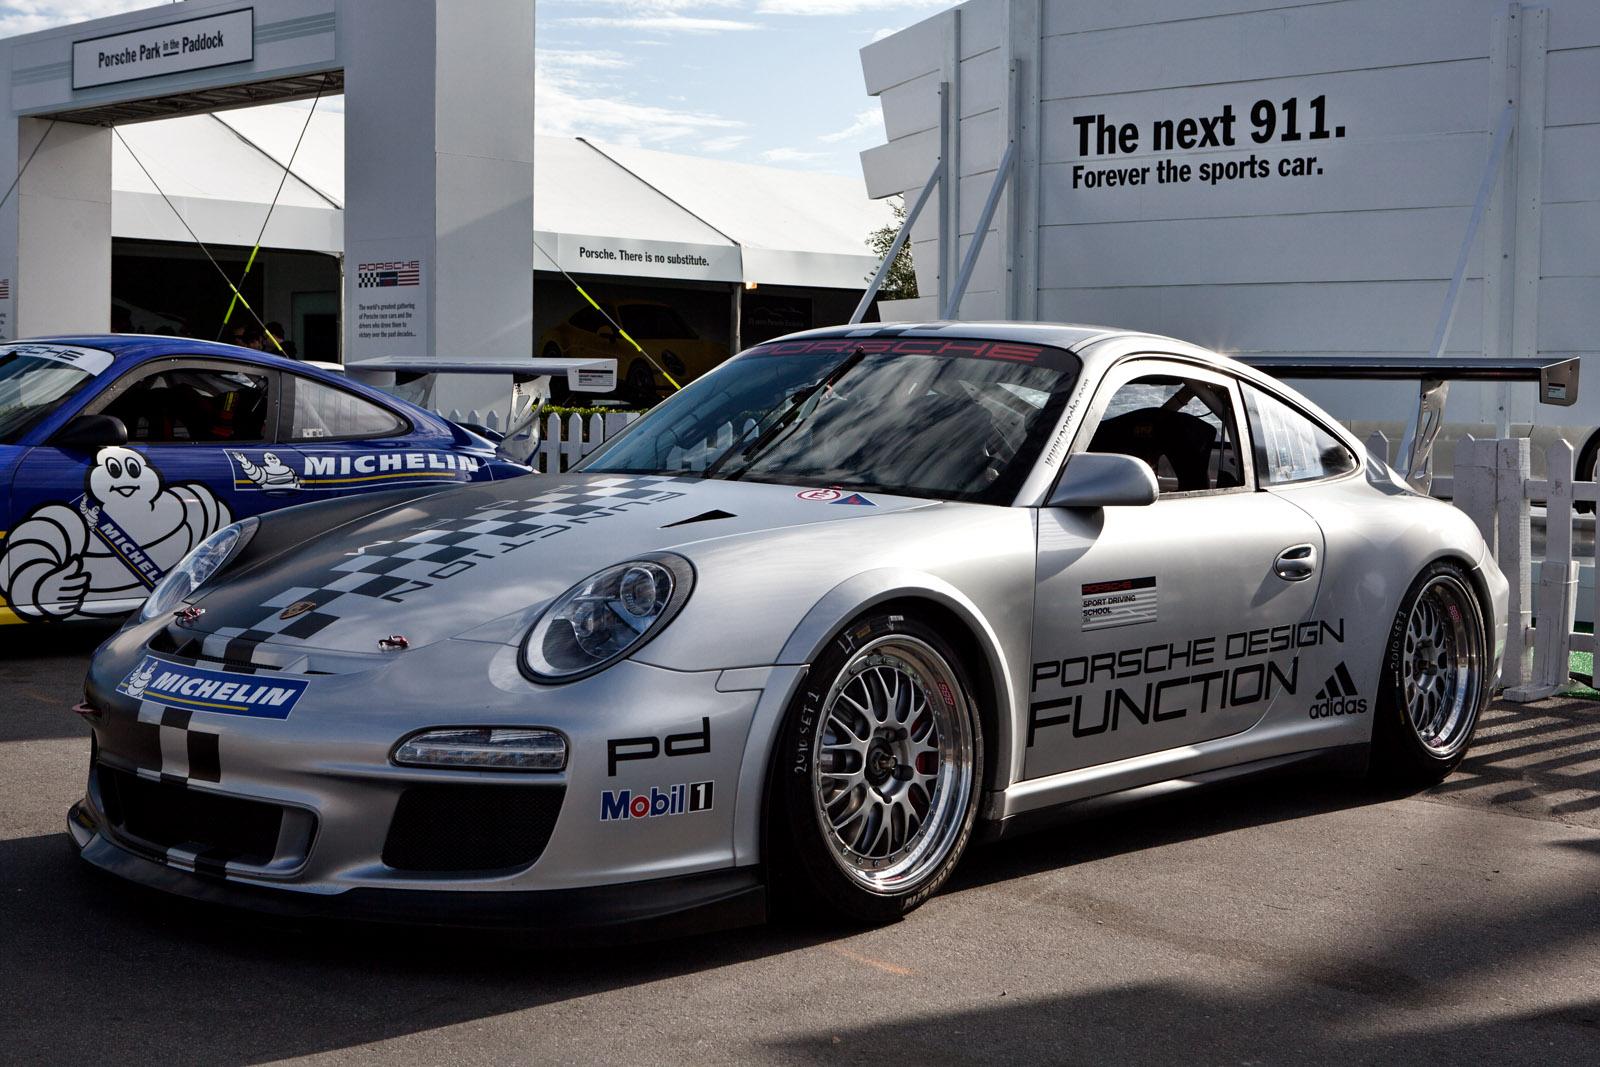 Mazda Raceway Laguna Seca >> File:Silver Porsche Design 997 GT3 Cup (Porsche Rennsport Reunion IV).jpg - Wikimedia Commons